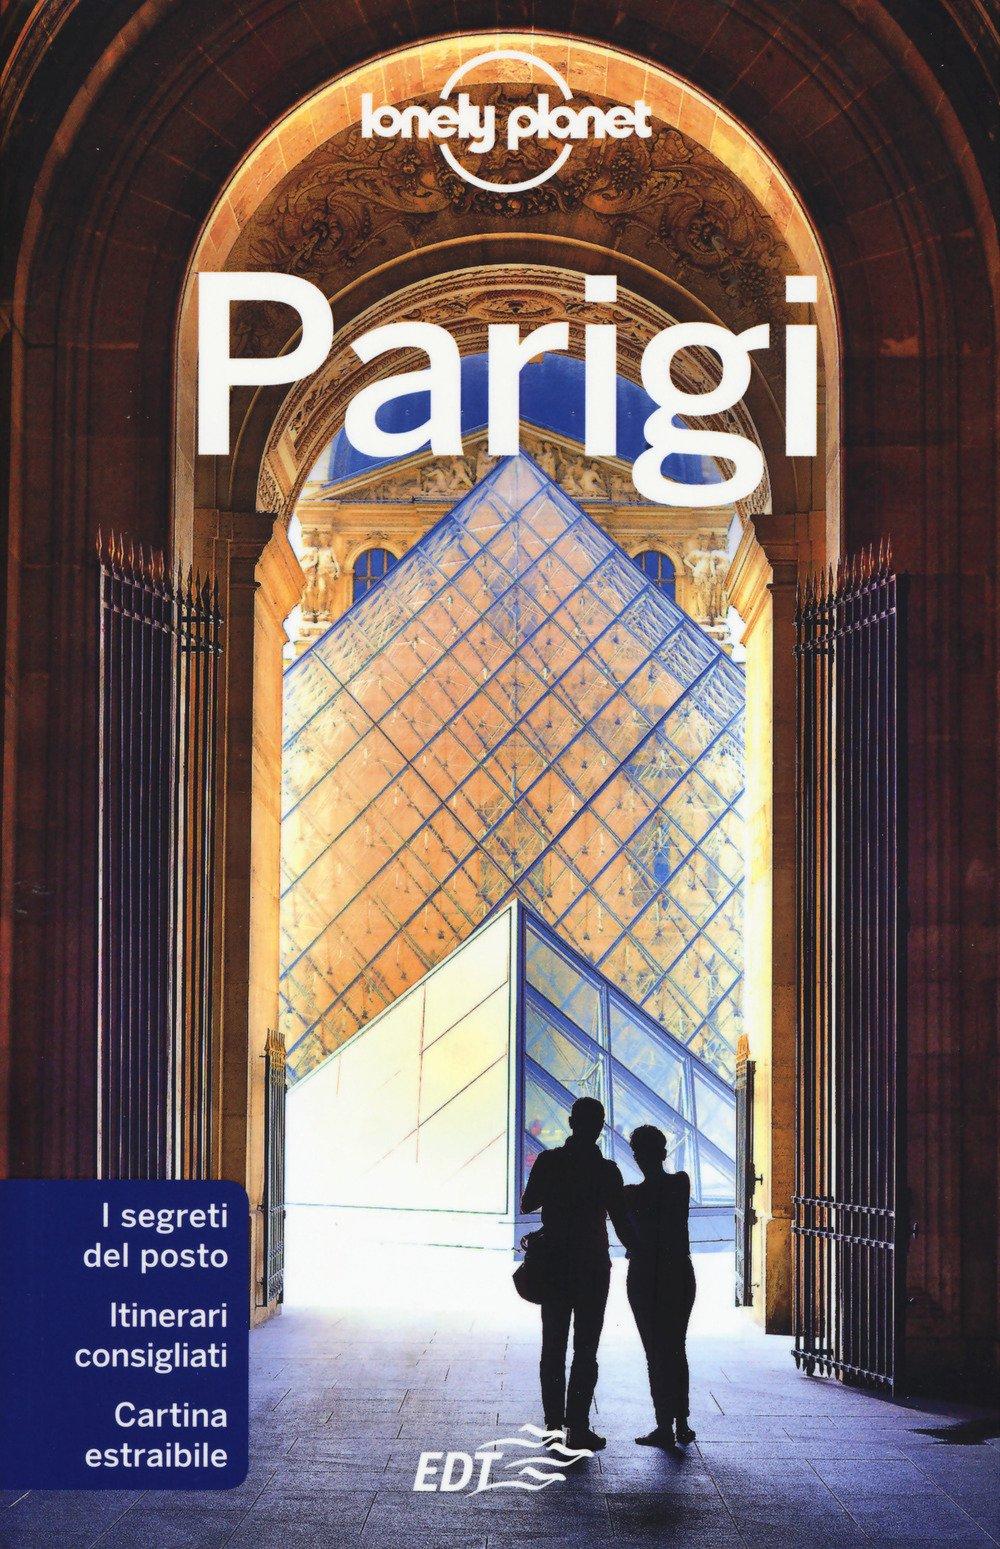 Parigi. Con carta estraibile Copertina flessibile – 4 mag 2017 Catherine Le Nevez Christopher Pitts Nicola Williams EDT